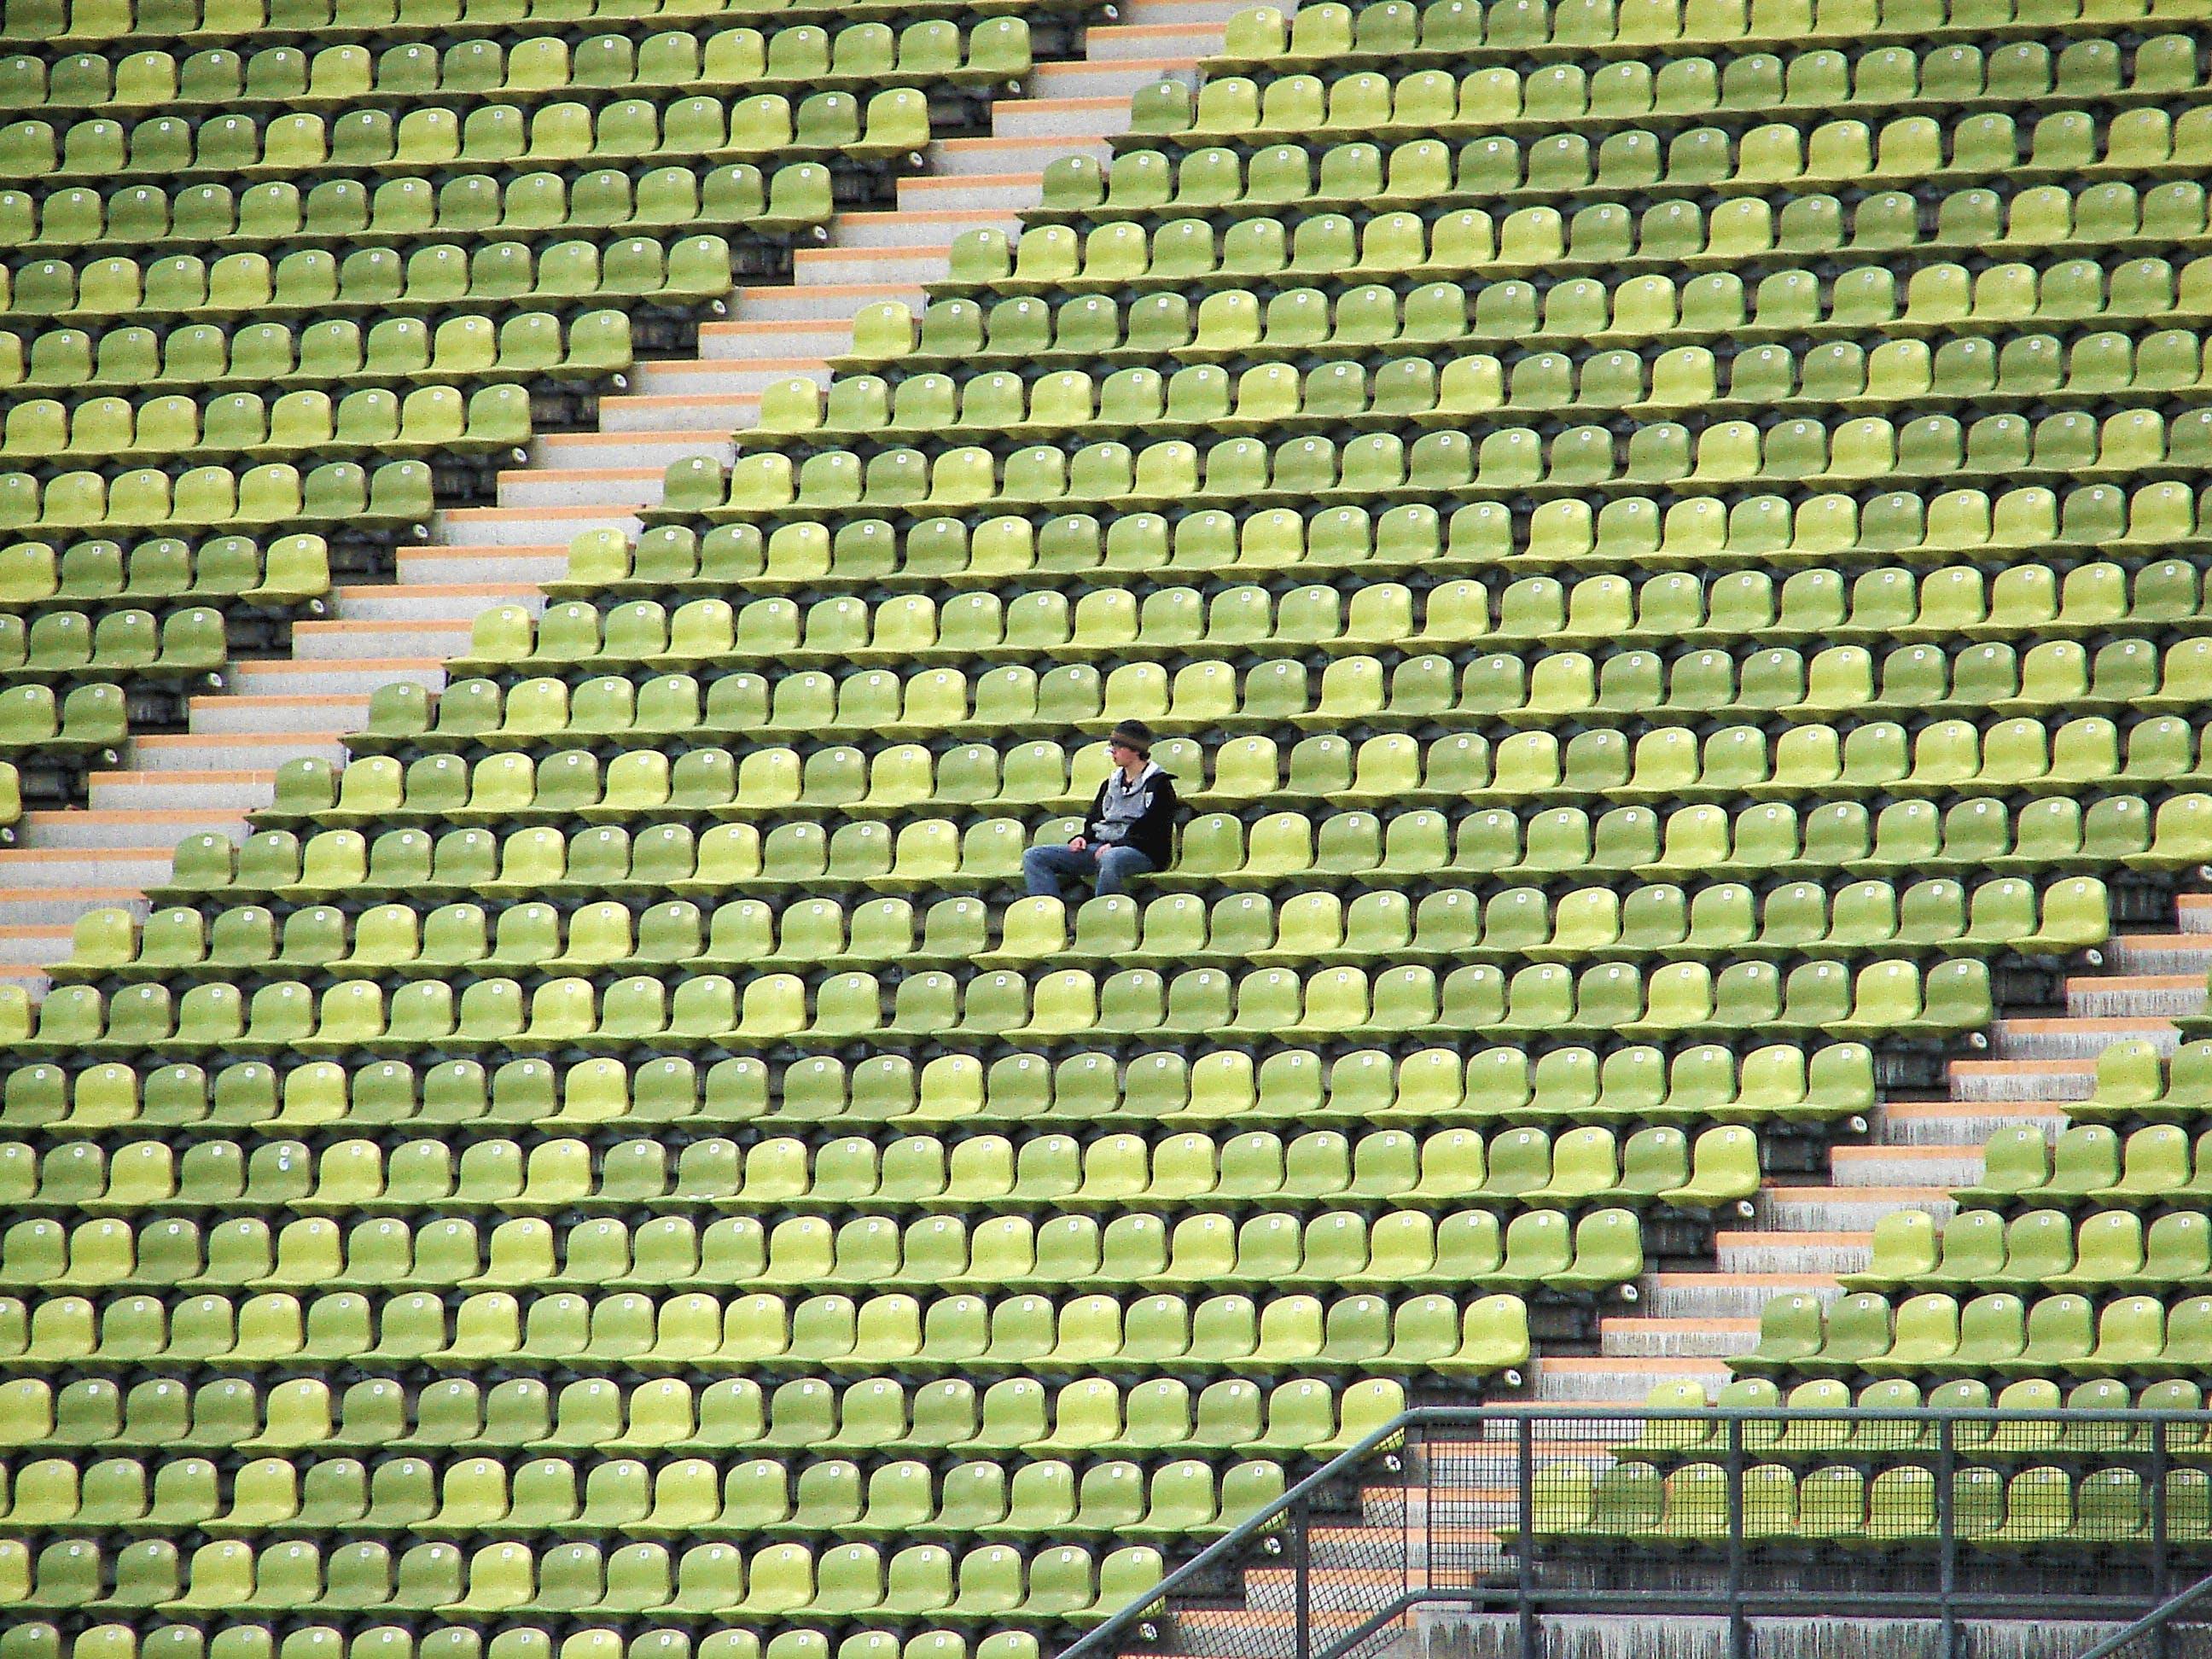 Woman in Grey Shirt Sitting on Stadium Chair